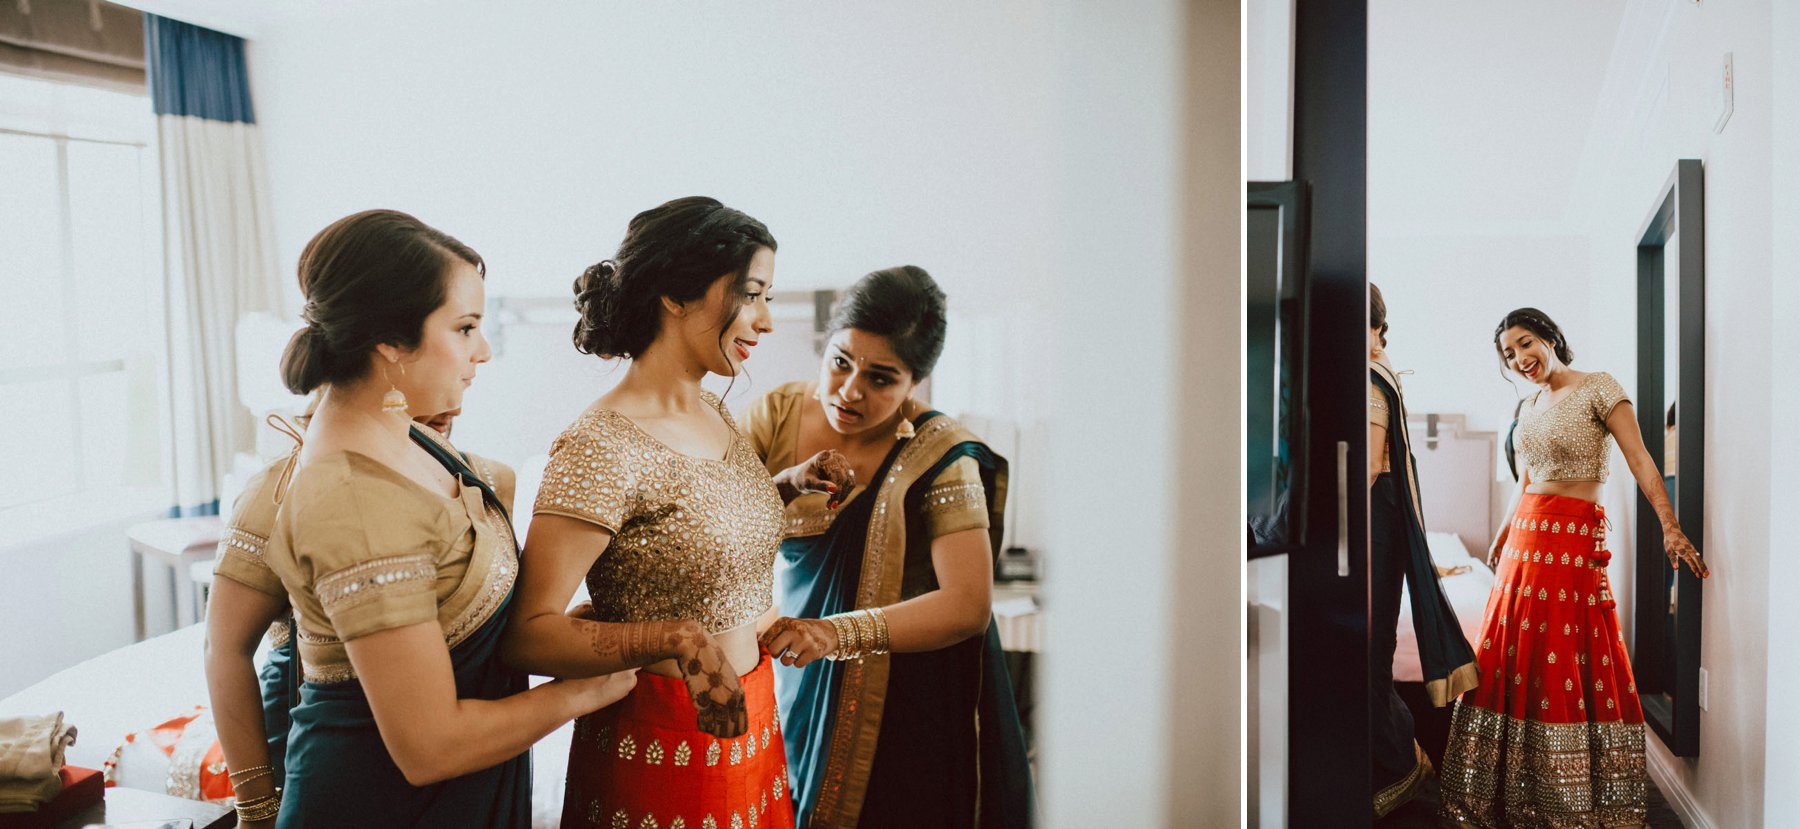 vie-philadelphia-indian-wedding-11.jpg